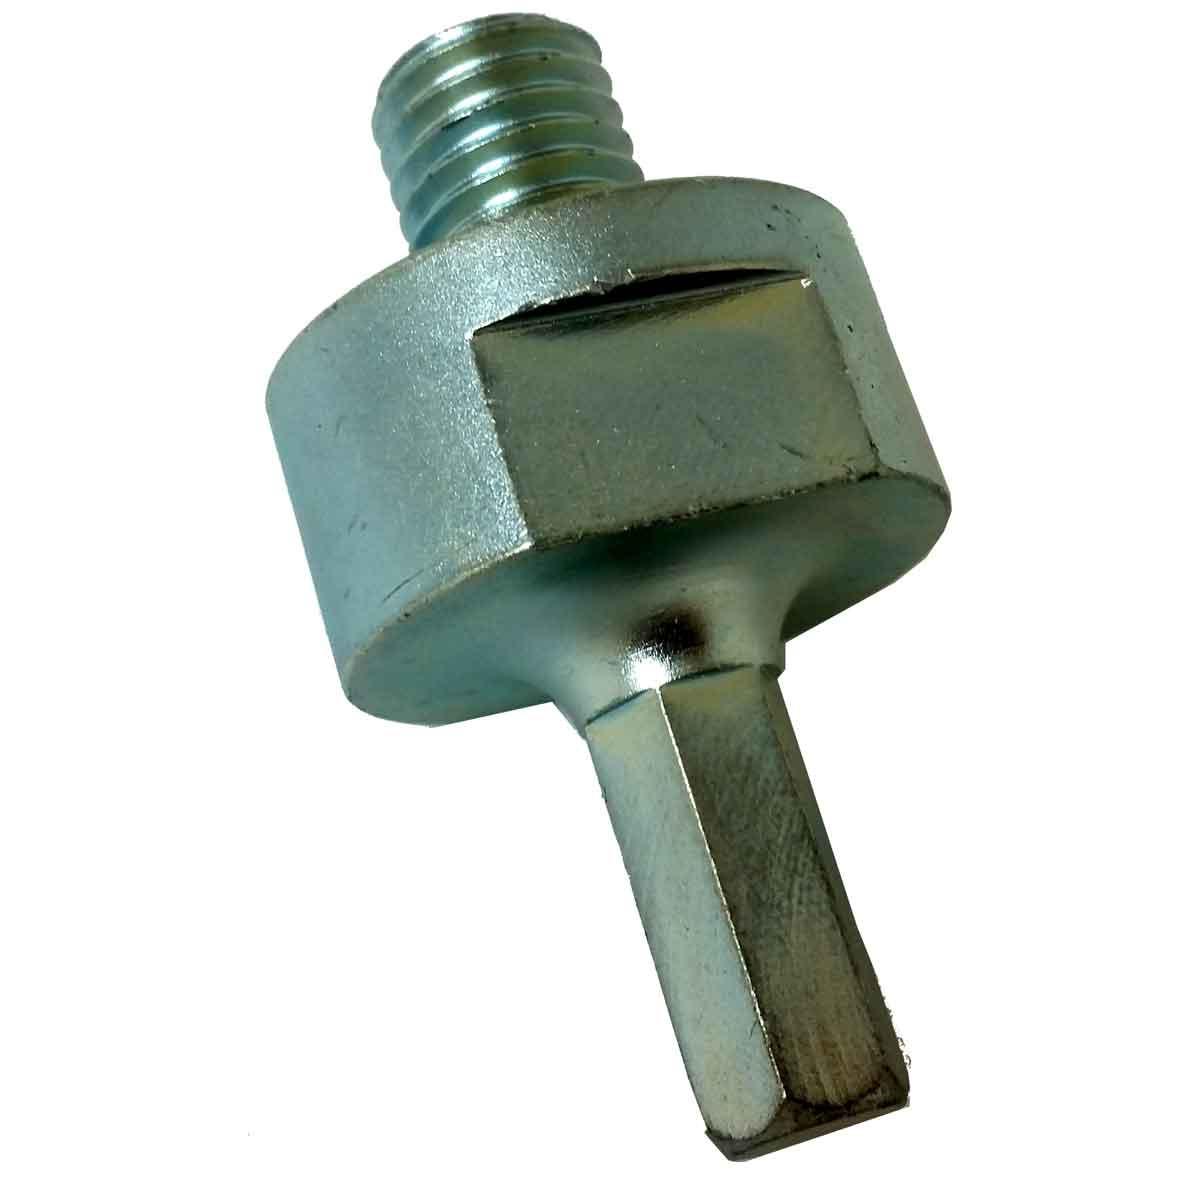 chuck adapter shank to thread